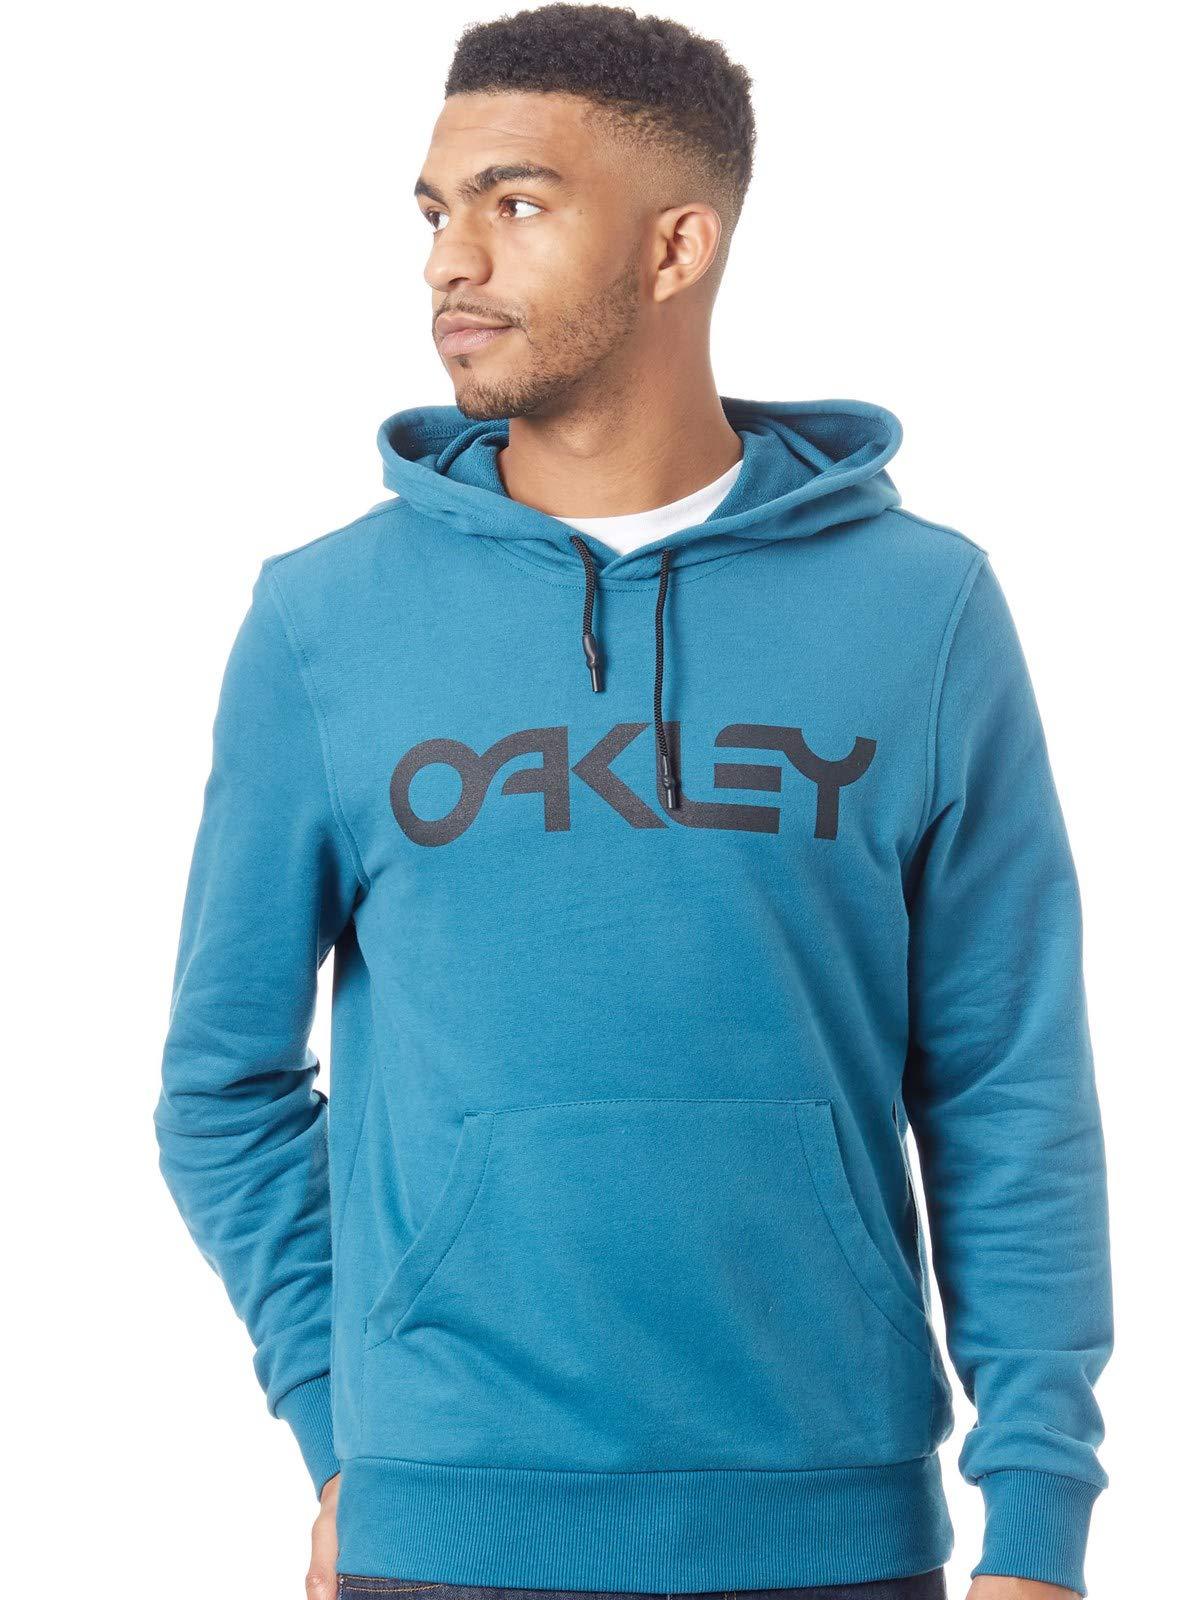 Oakley Sudadera con Capucha B1B Azul Coral